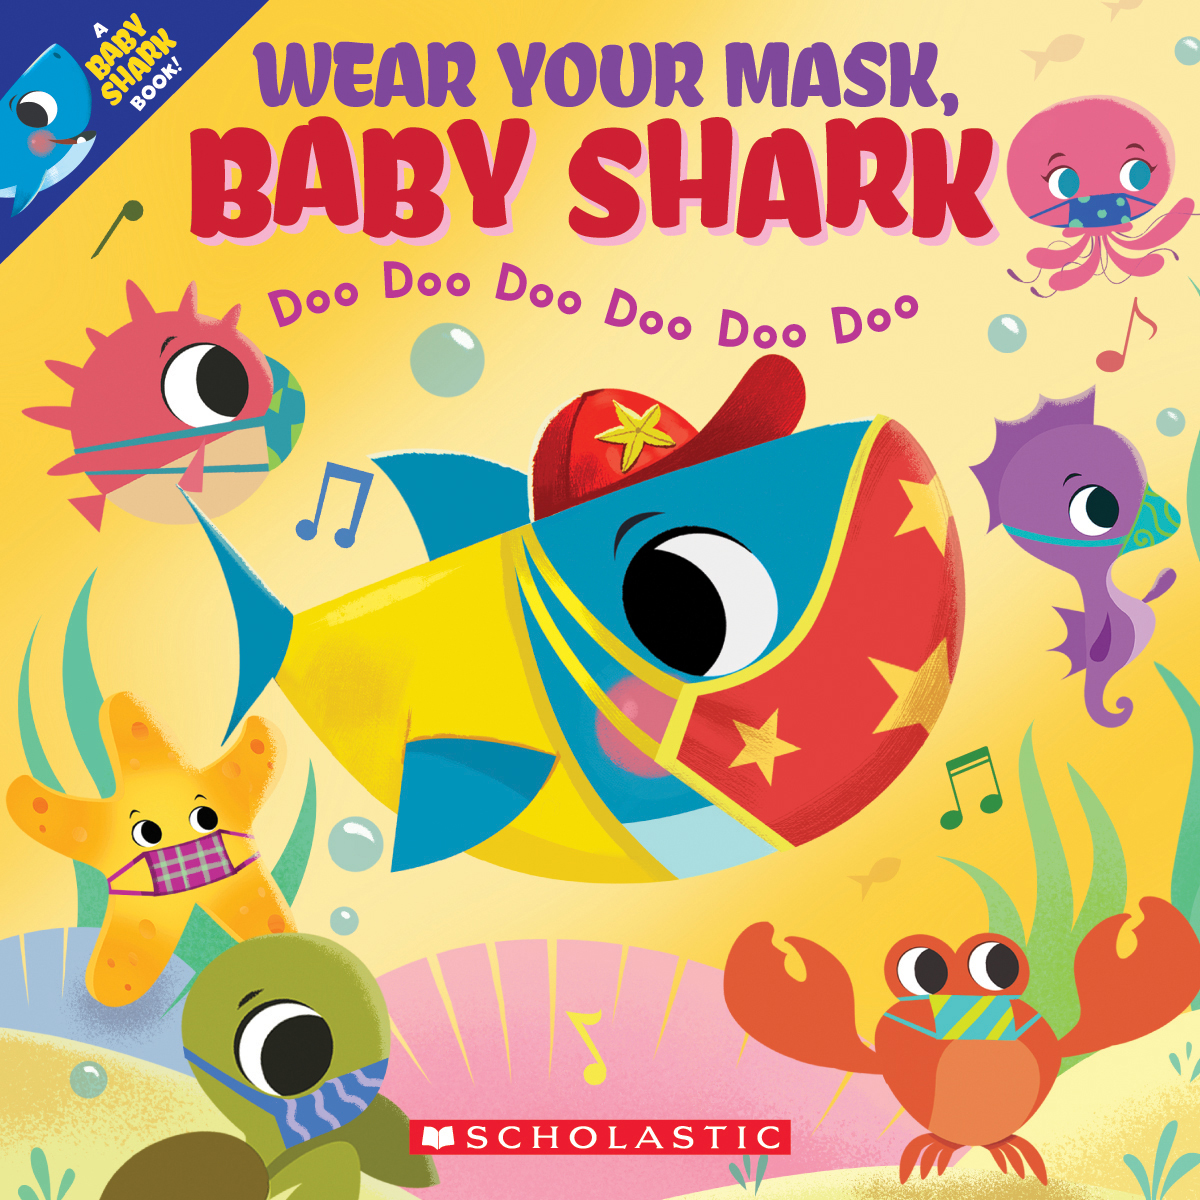 Wear Your Mask, Baby Shark